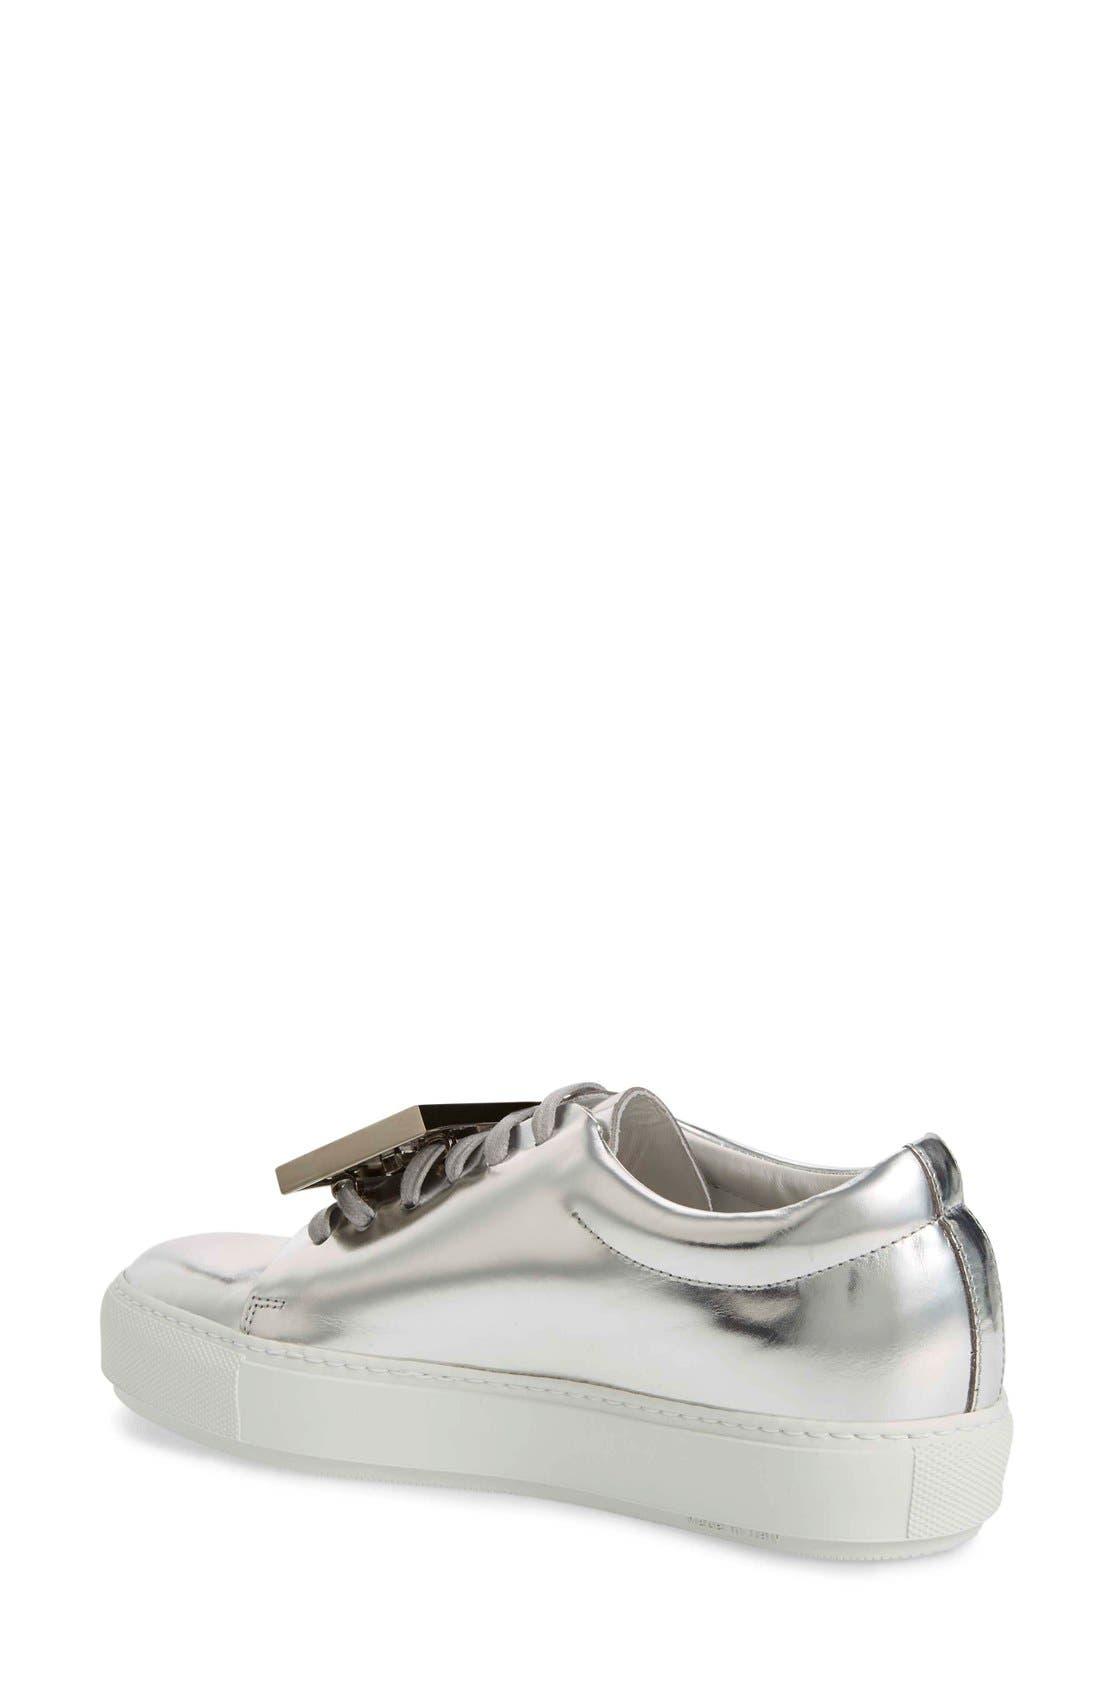 Adriana Silver Metallic Sneaker,                             Alternate thumbnail 2, color,                             044